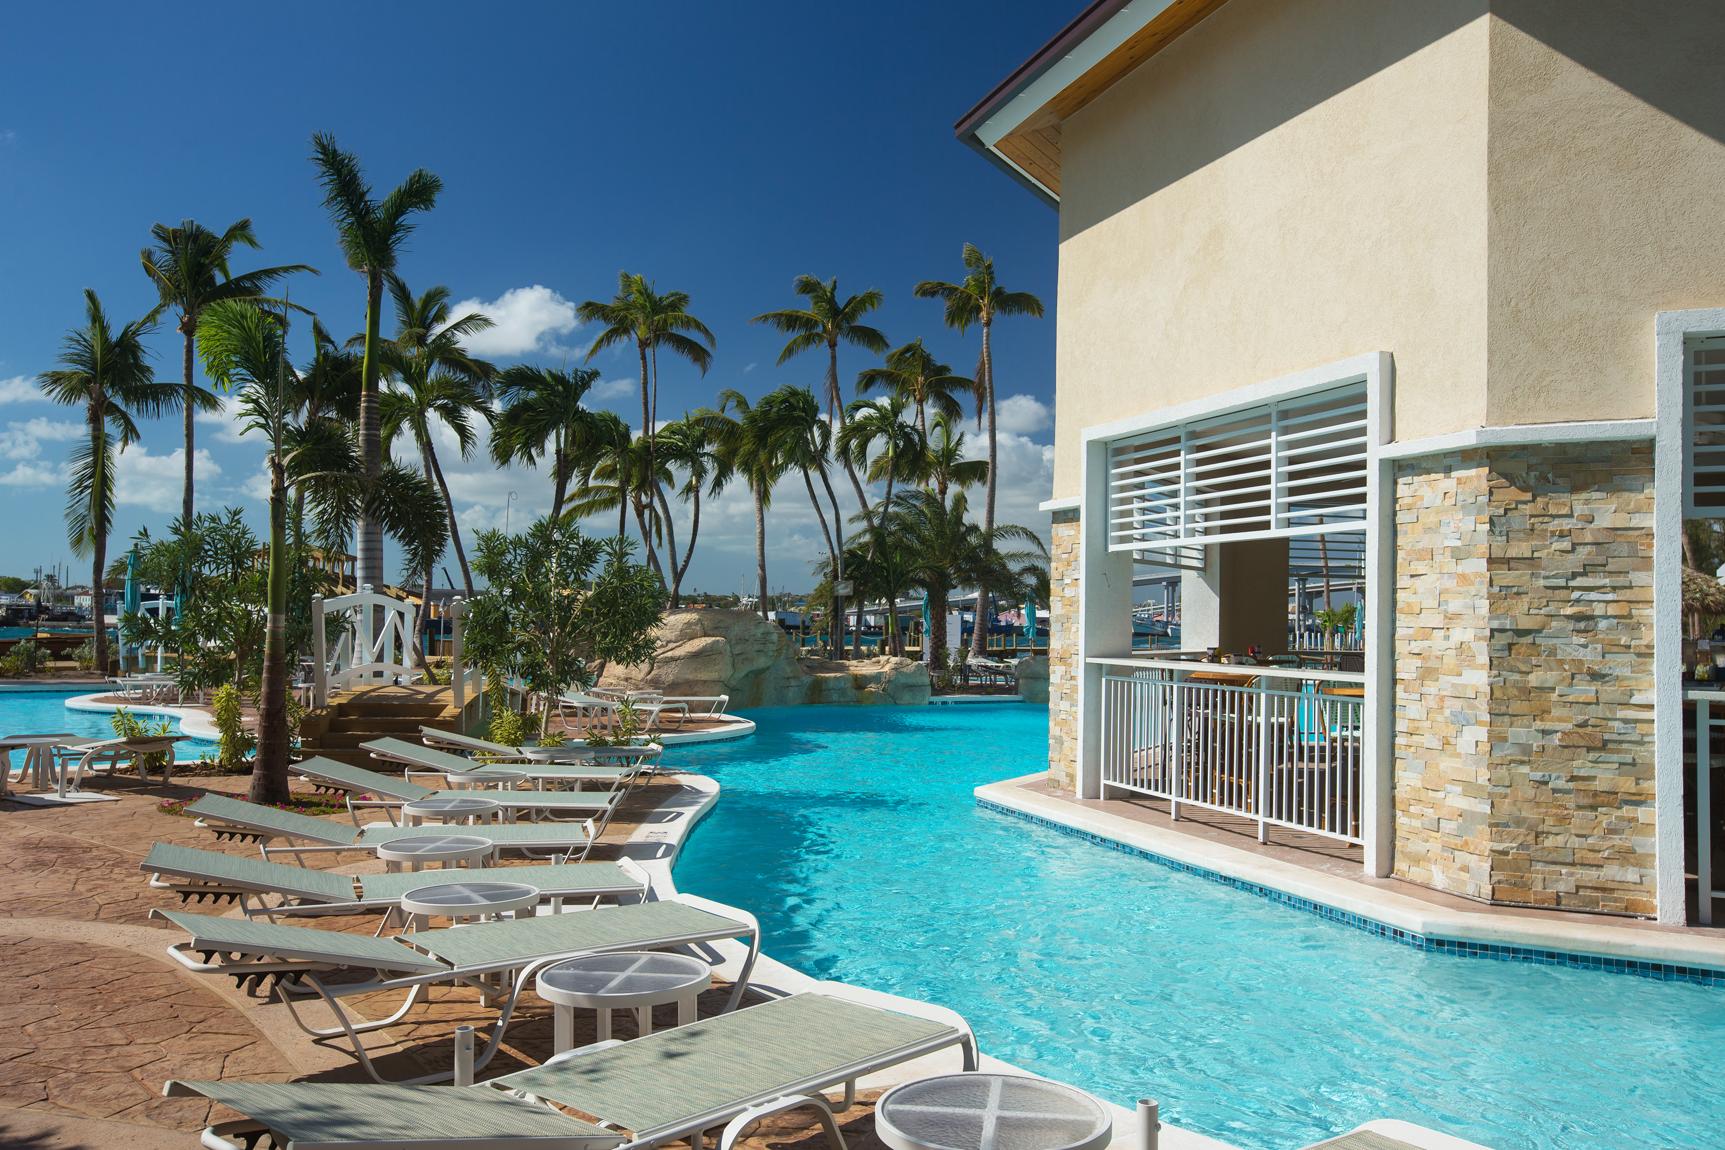 Warwick Paradise Island Bahamas Pool Deck with Chickcharnies